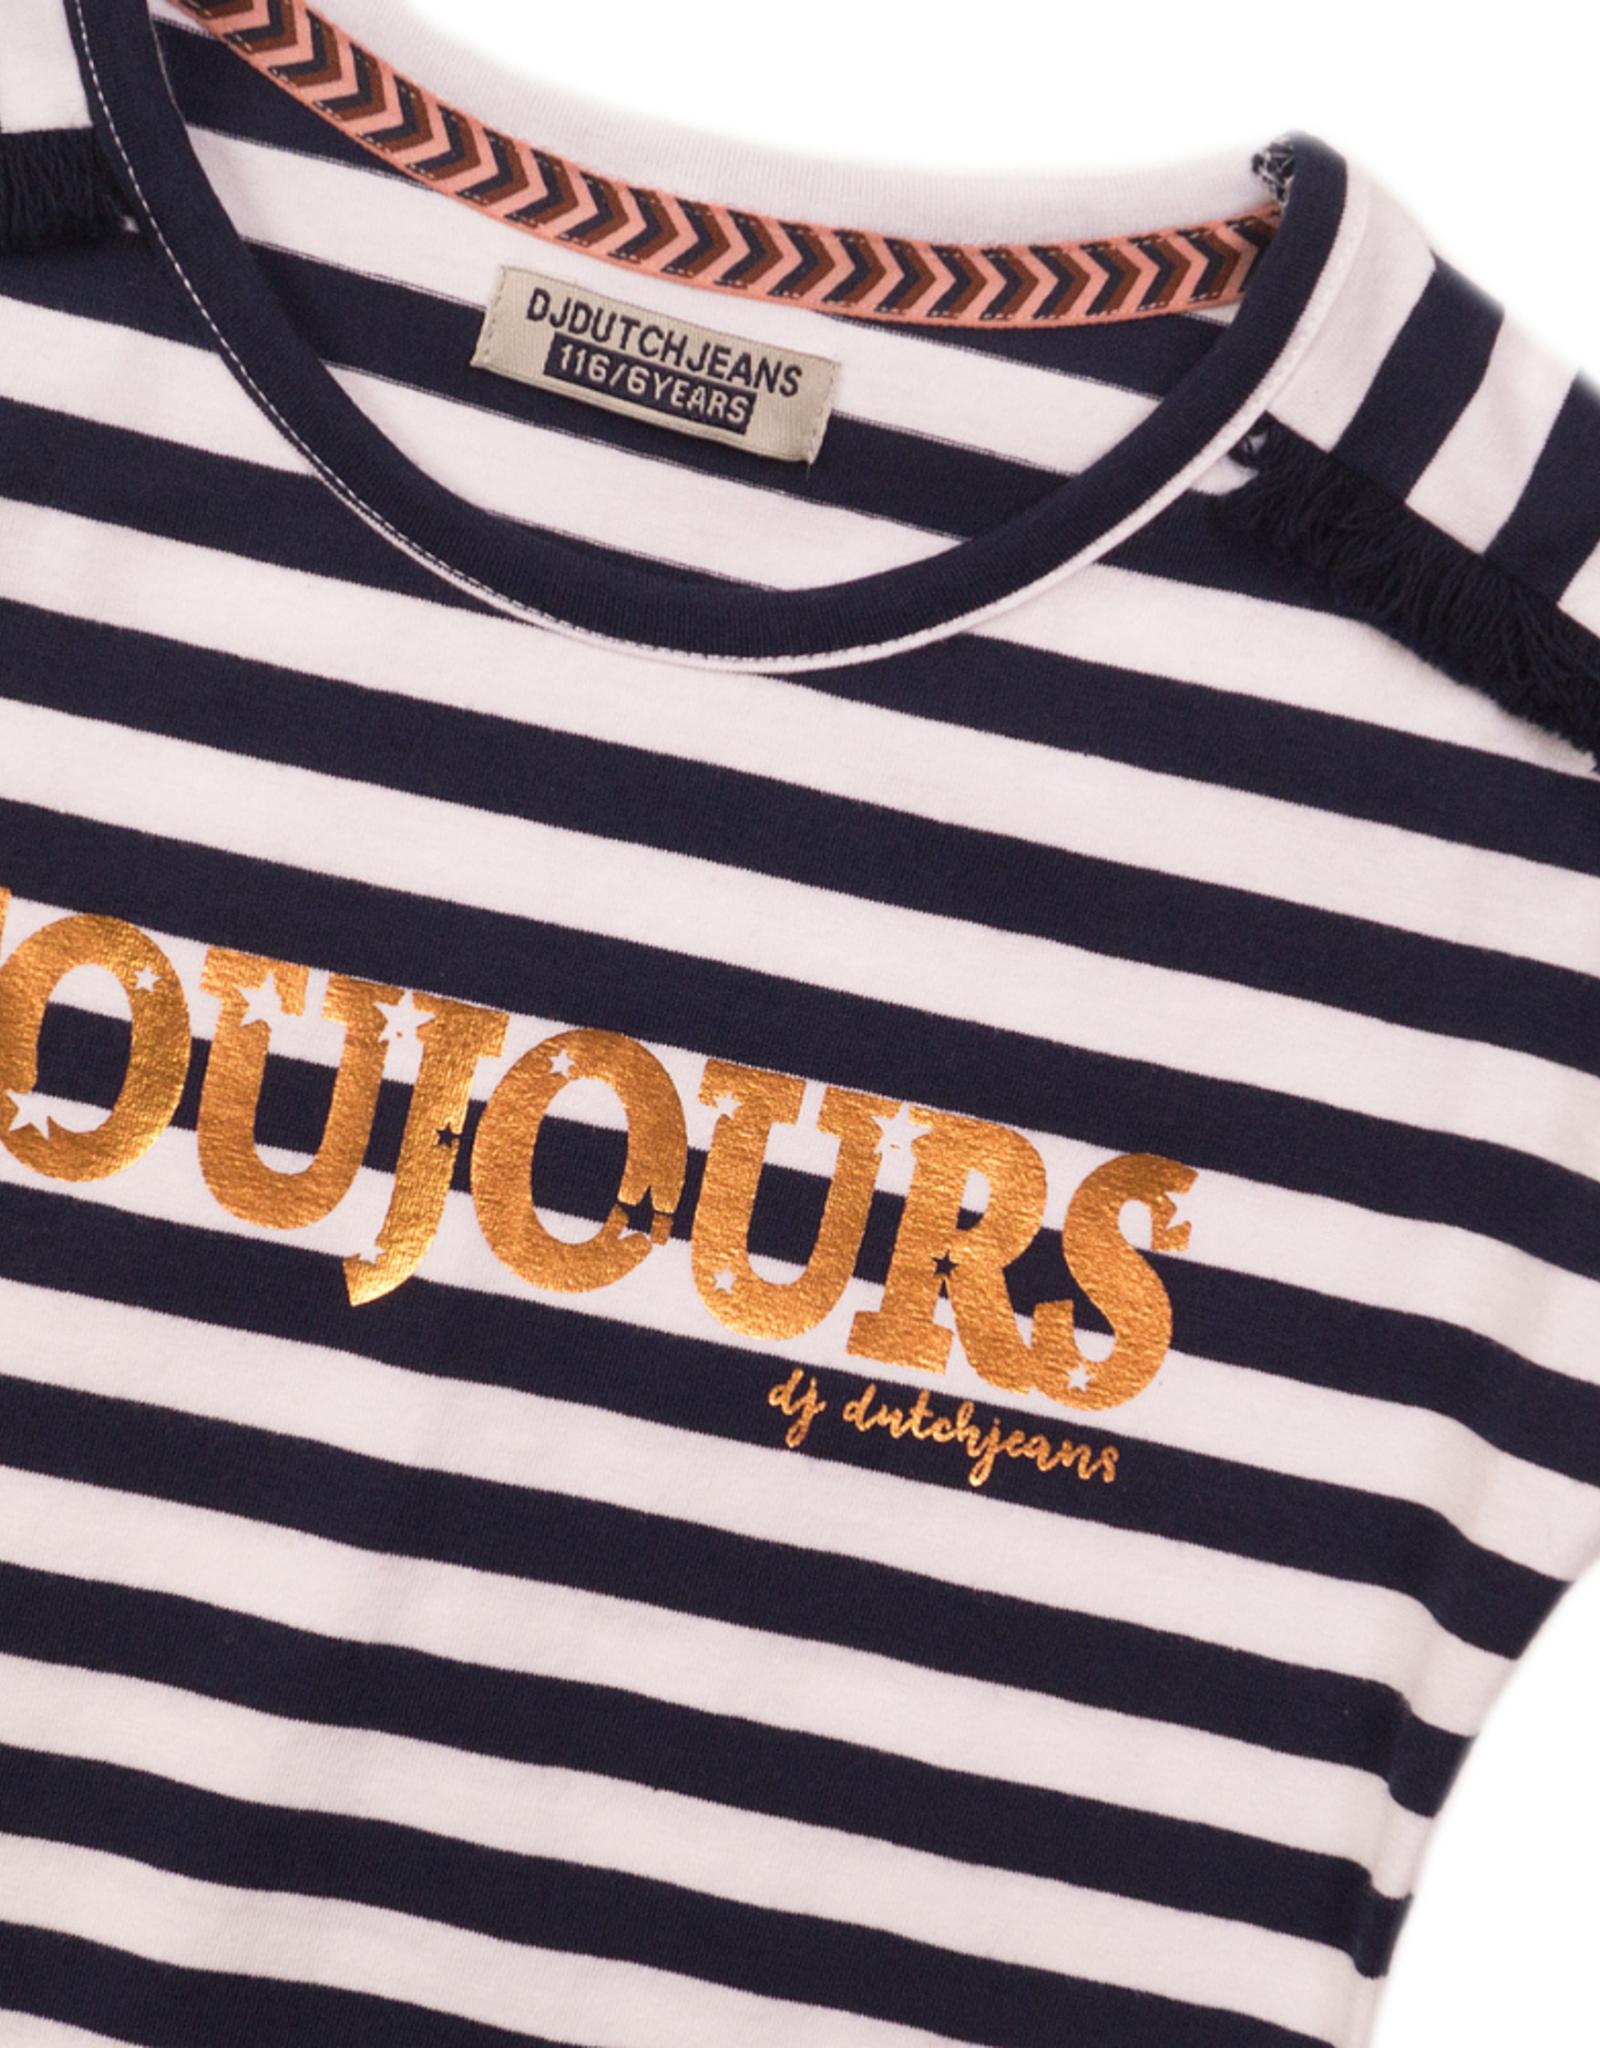 DJ Dutchjeans DJ Dutchjeans shirt 38010 navy stripe